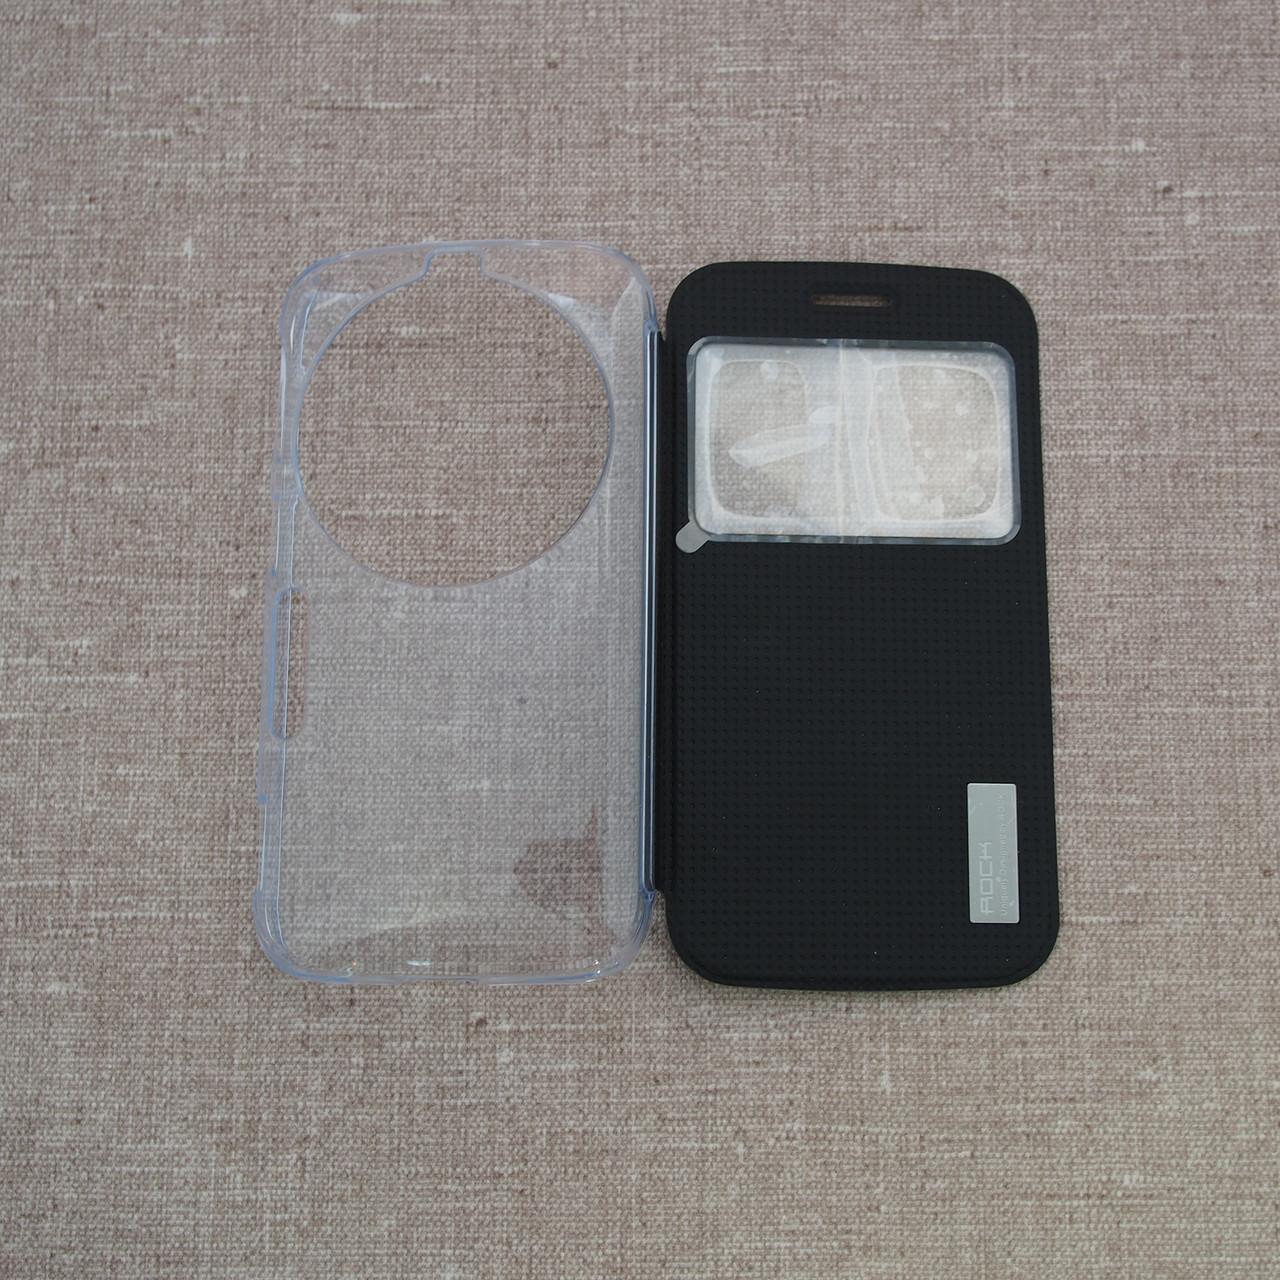 Чехол ROCK Elegant Samsung Galaxy S5 ZOOM black Для телефона K zoom Rock